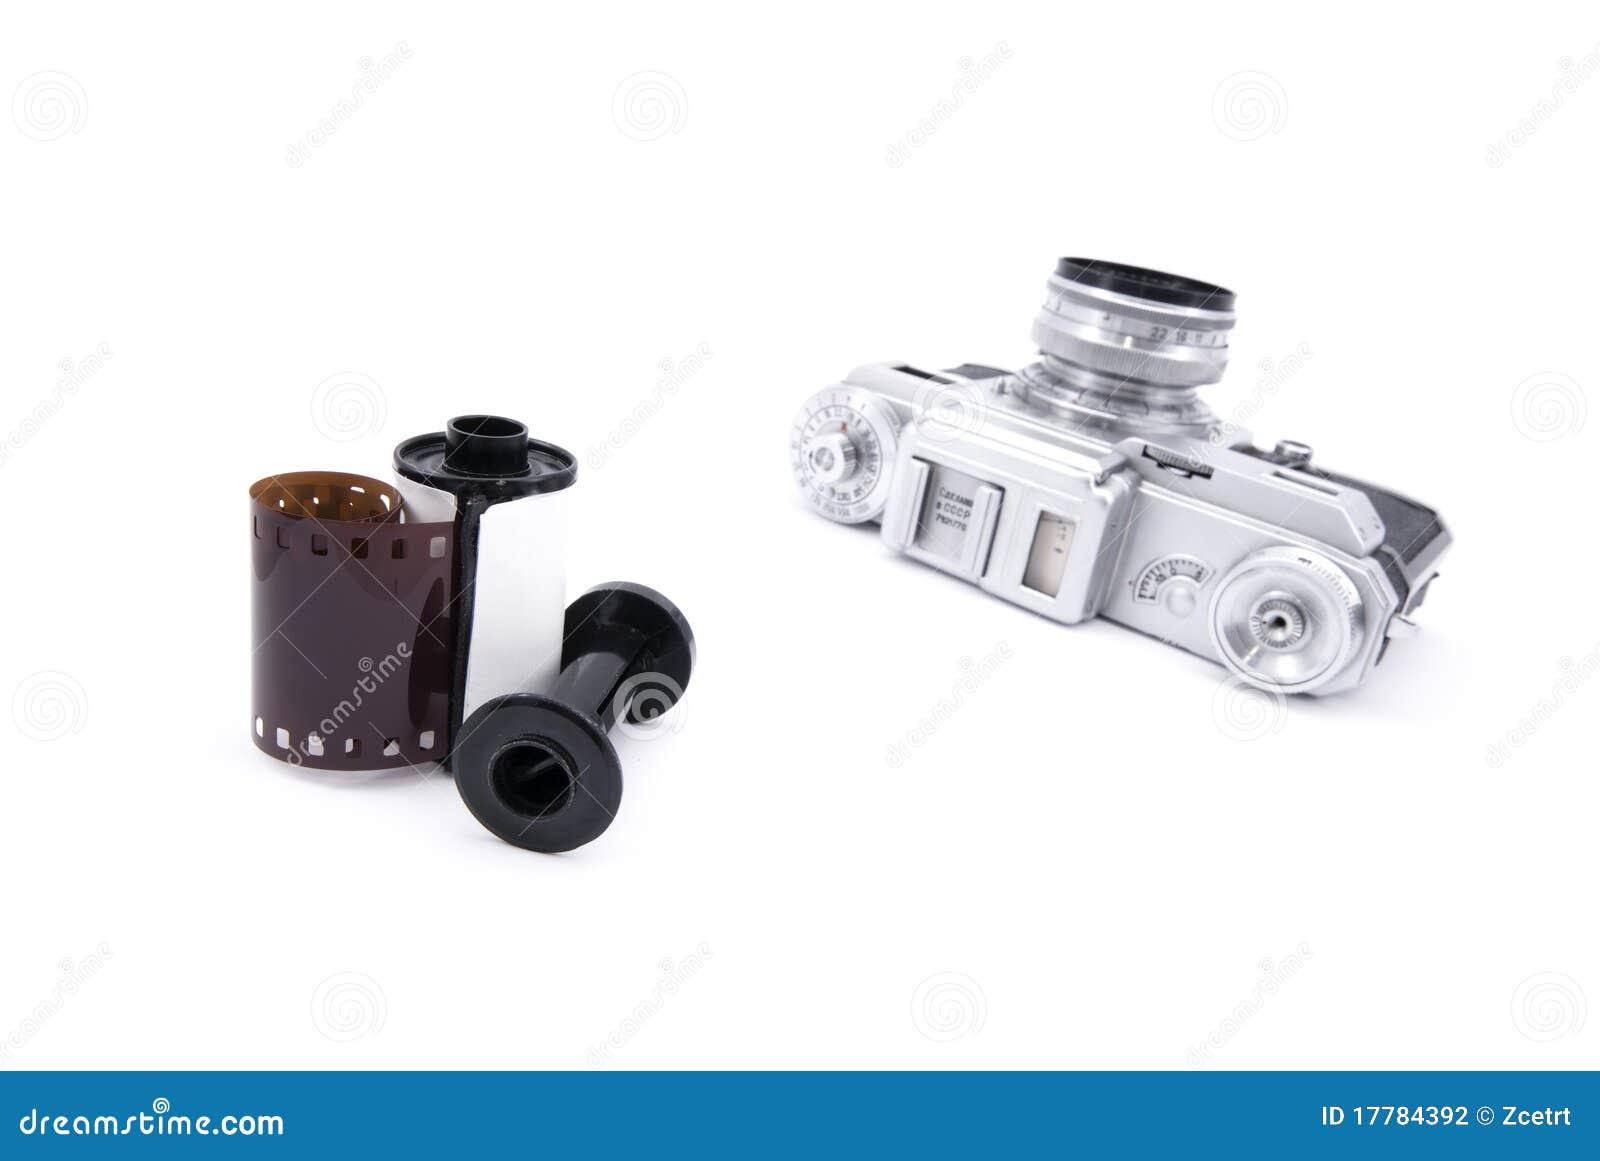 Analoge entfernungsmesserkamera mit dem mm film stockfoto bild